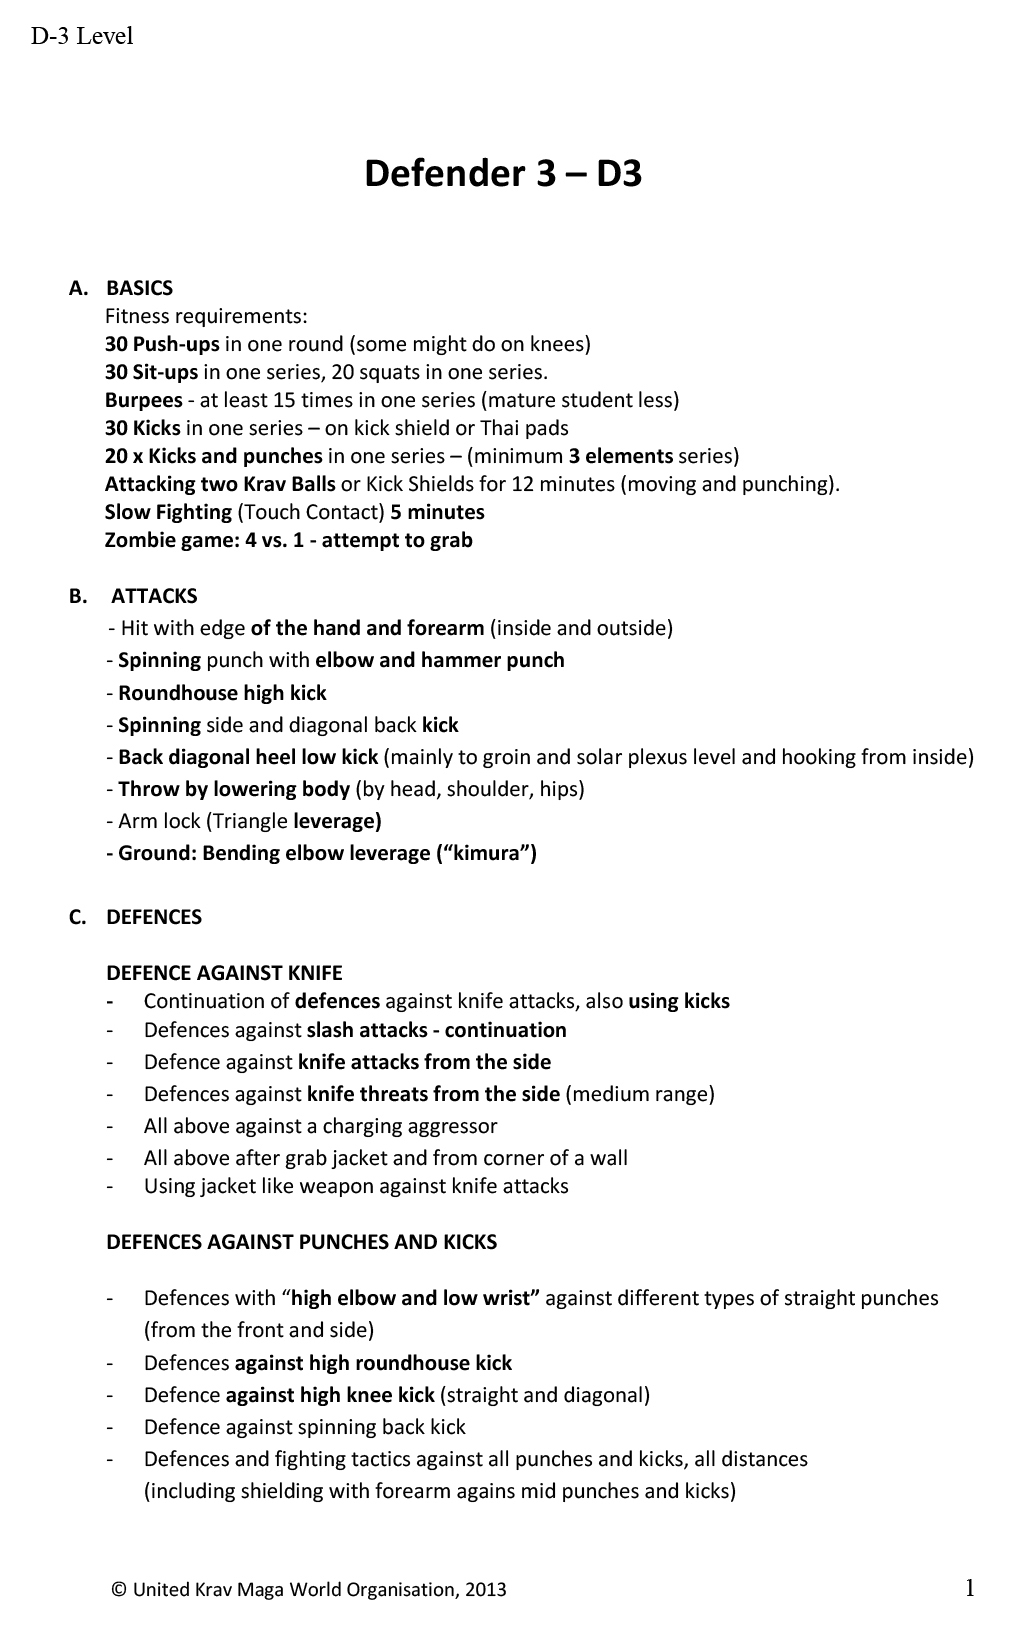 D3_ENGLISH.pdf-1.jpg